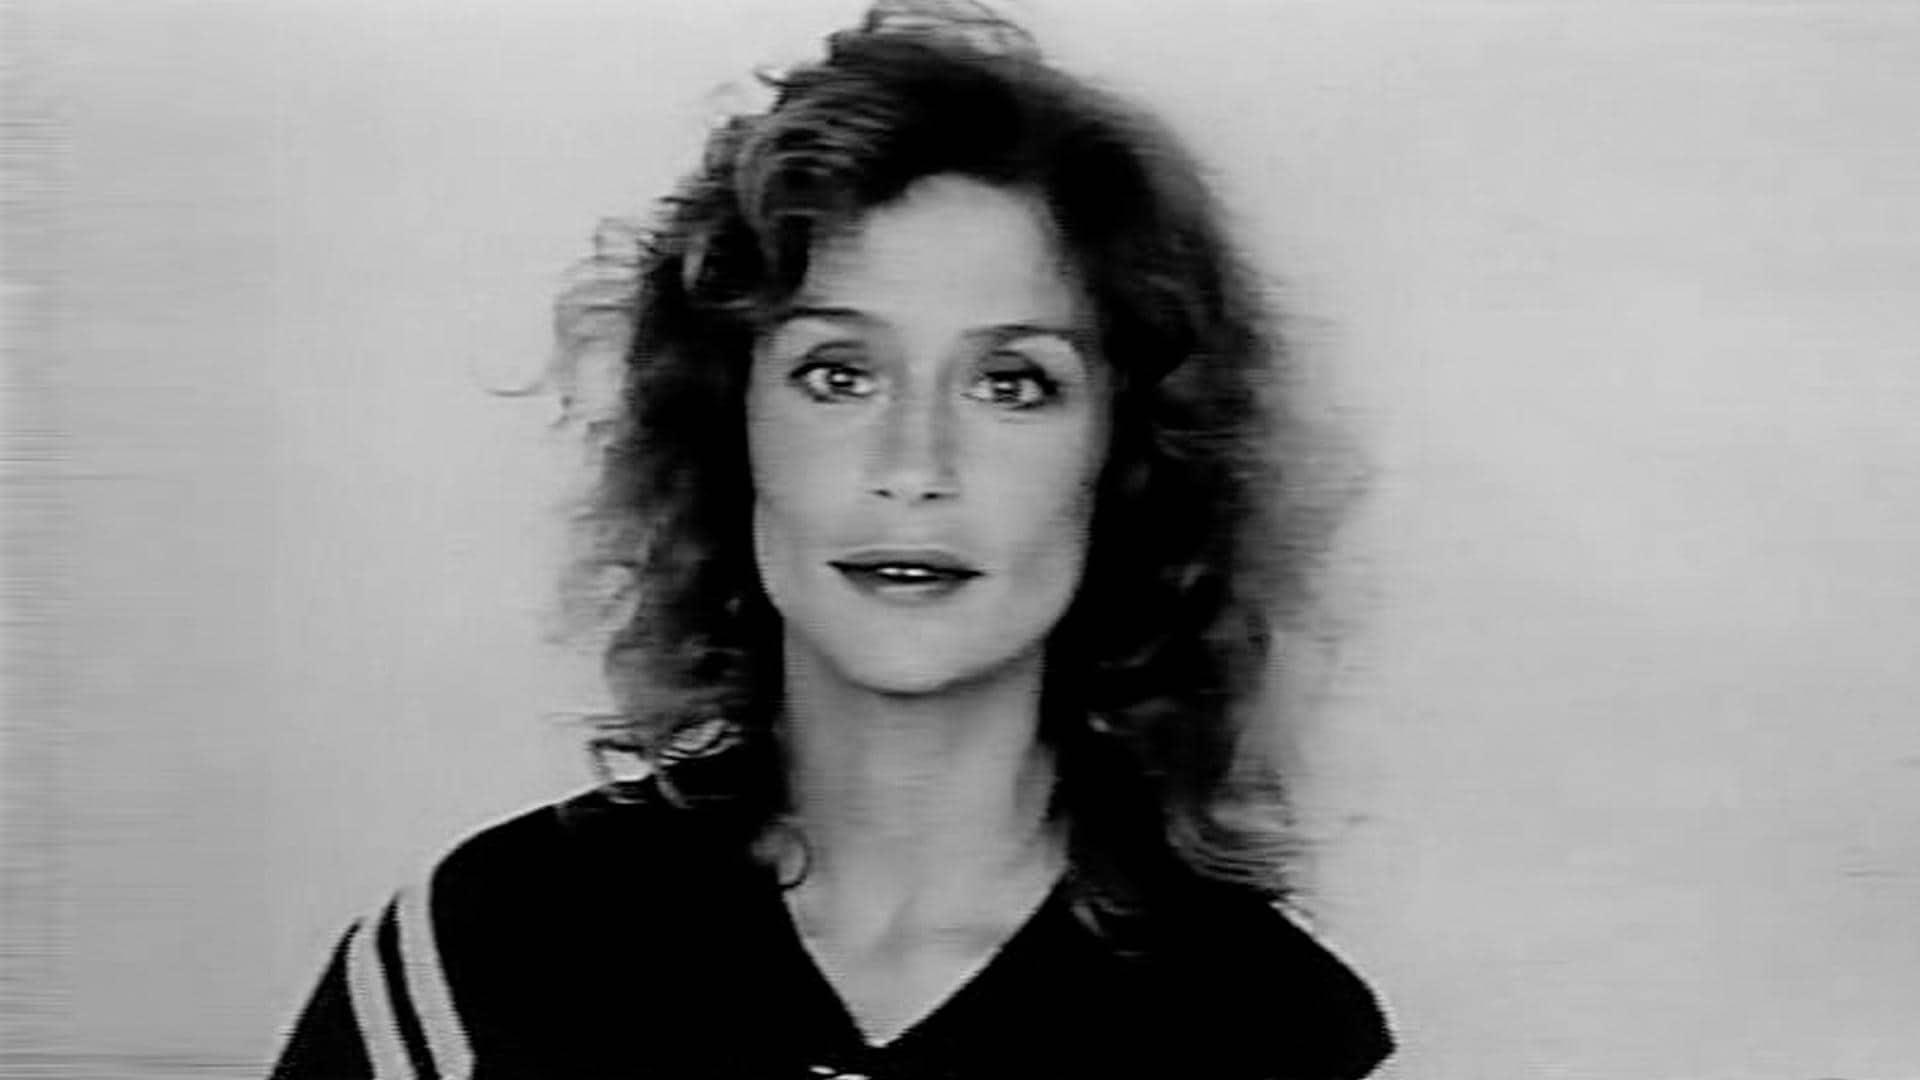 Lauren Hutton: November 7, 1981